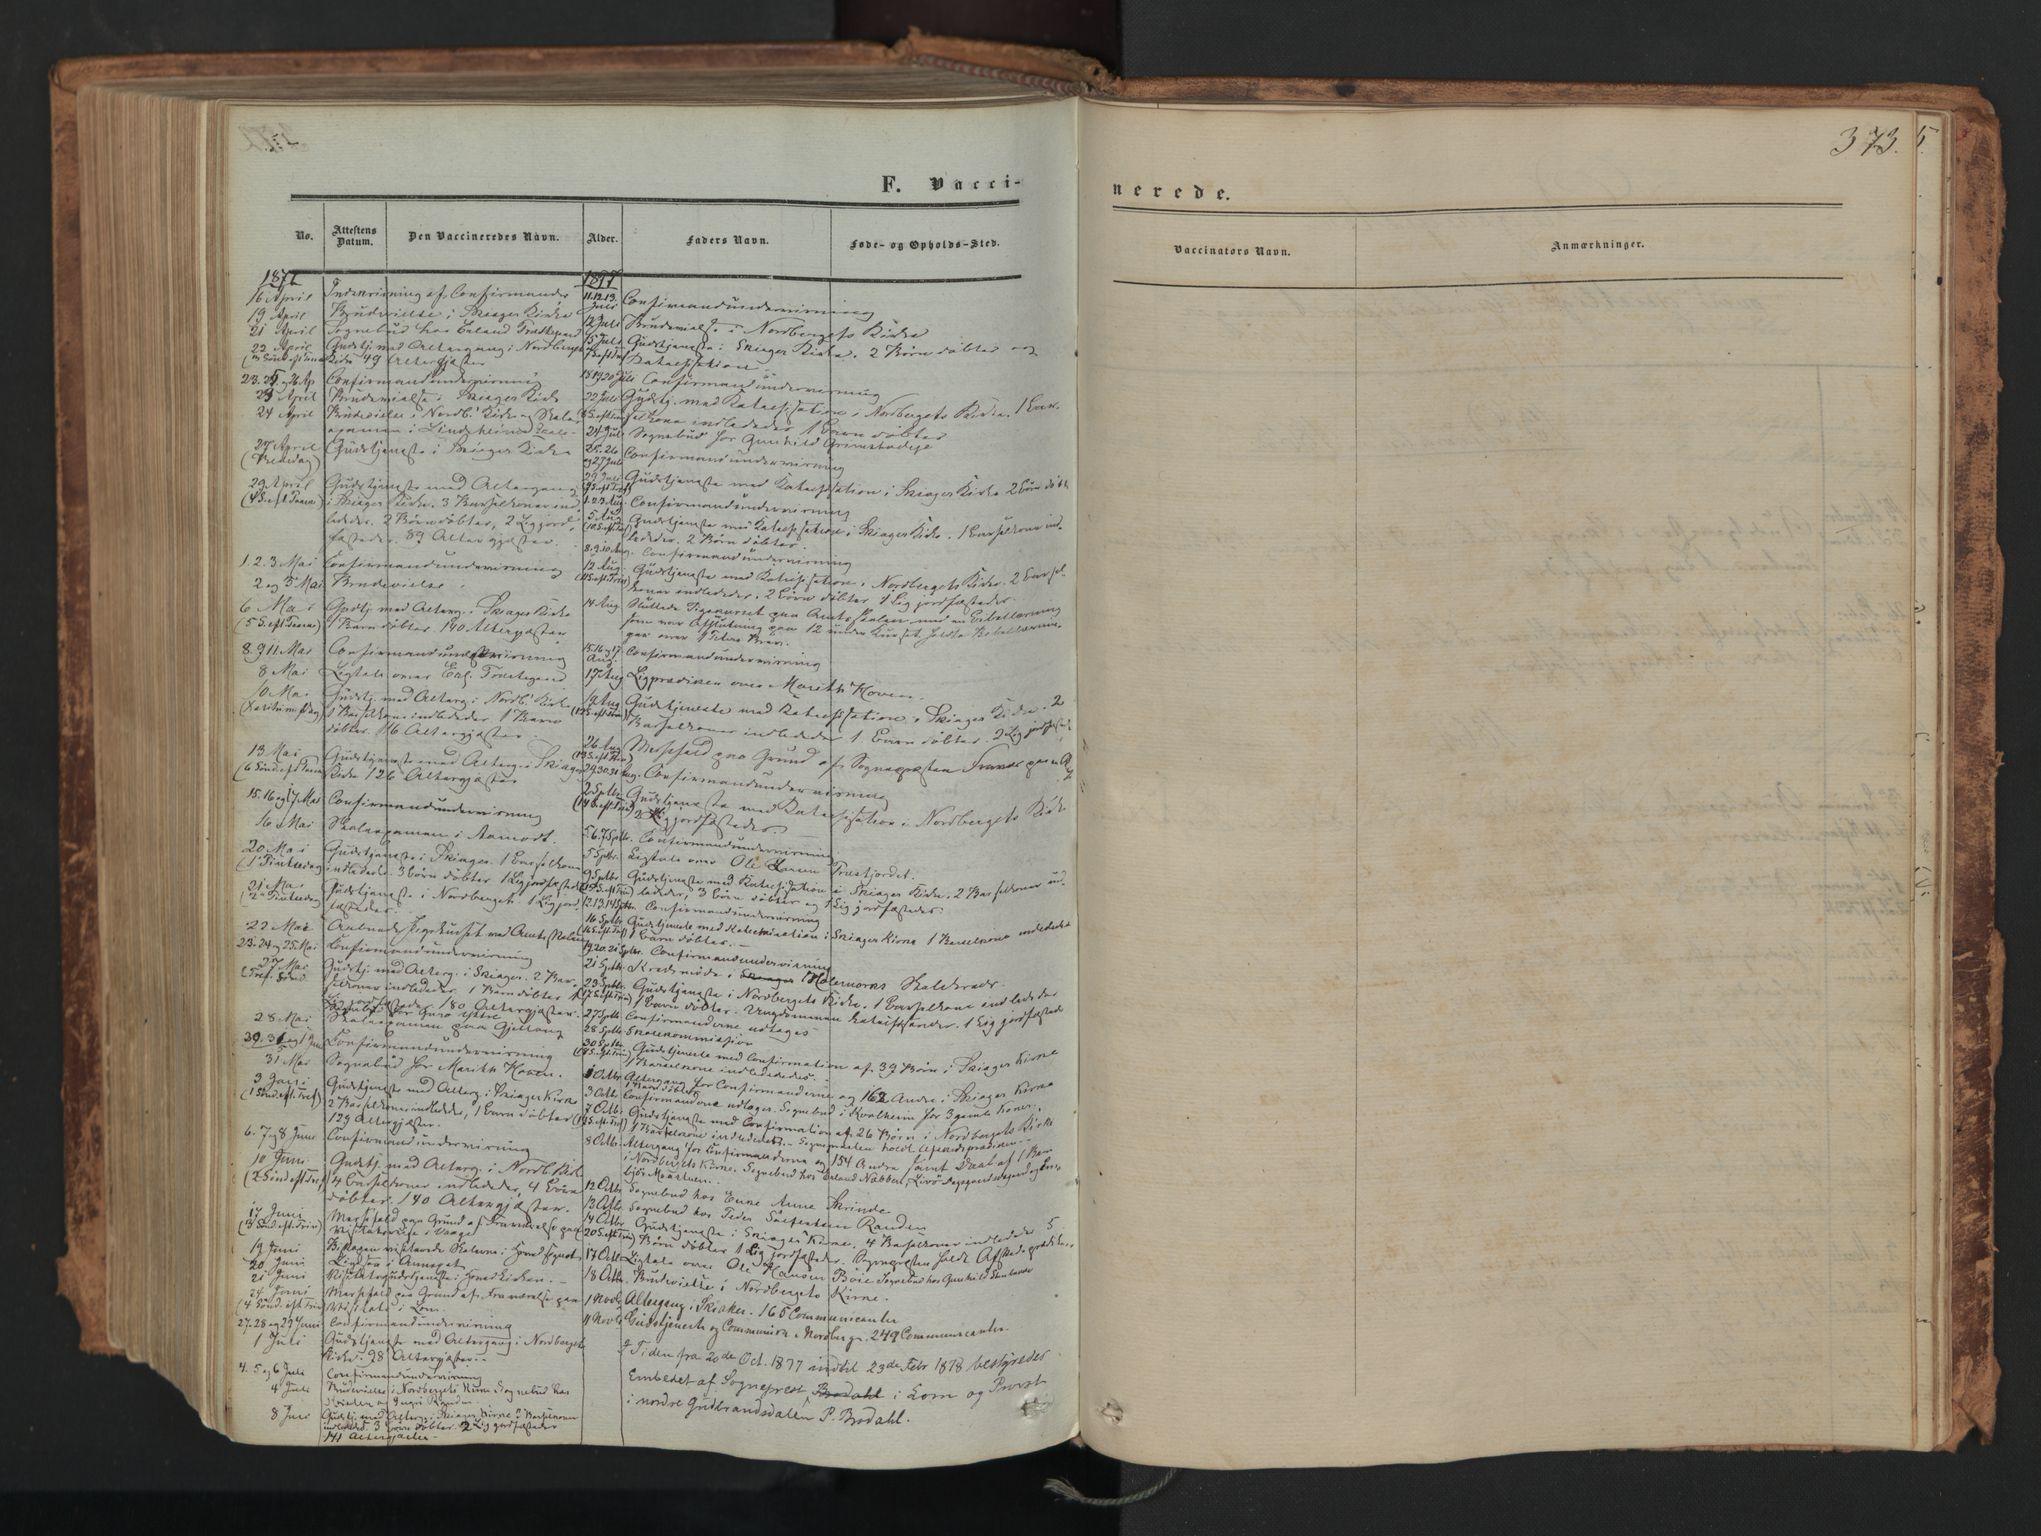 SAH, Skjåk prestekontor, Ministerialbok nr. 1, 1863-1879, s. 373